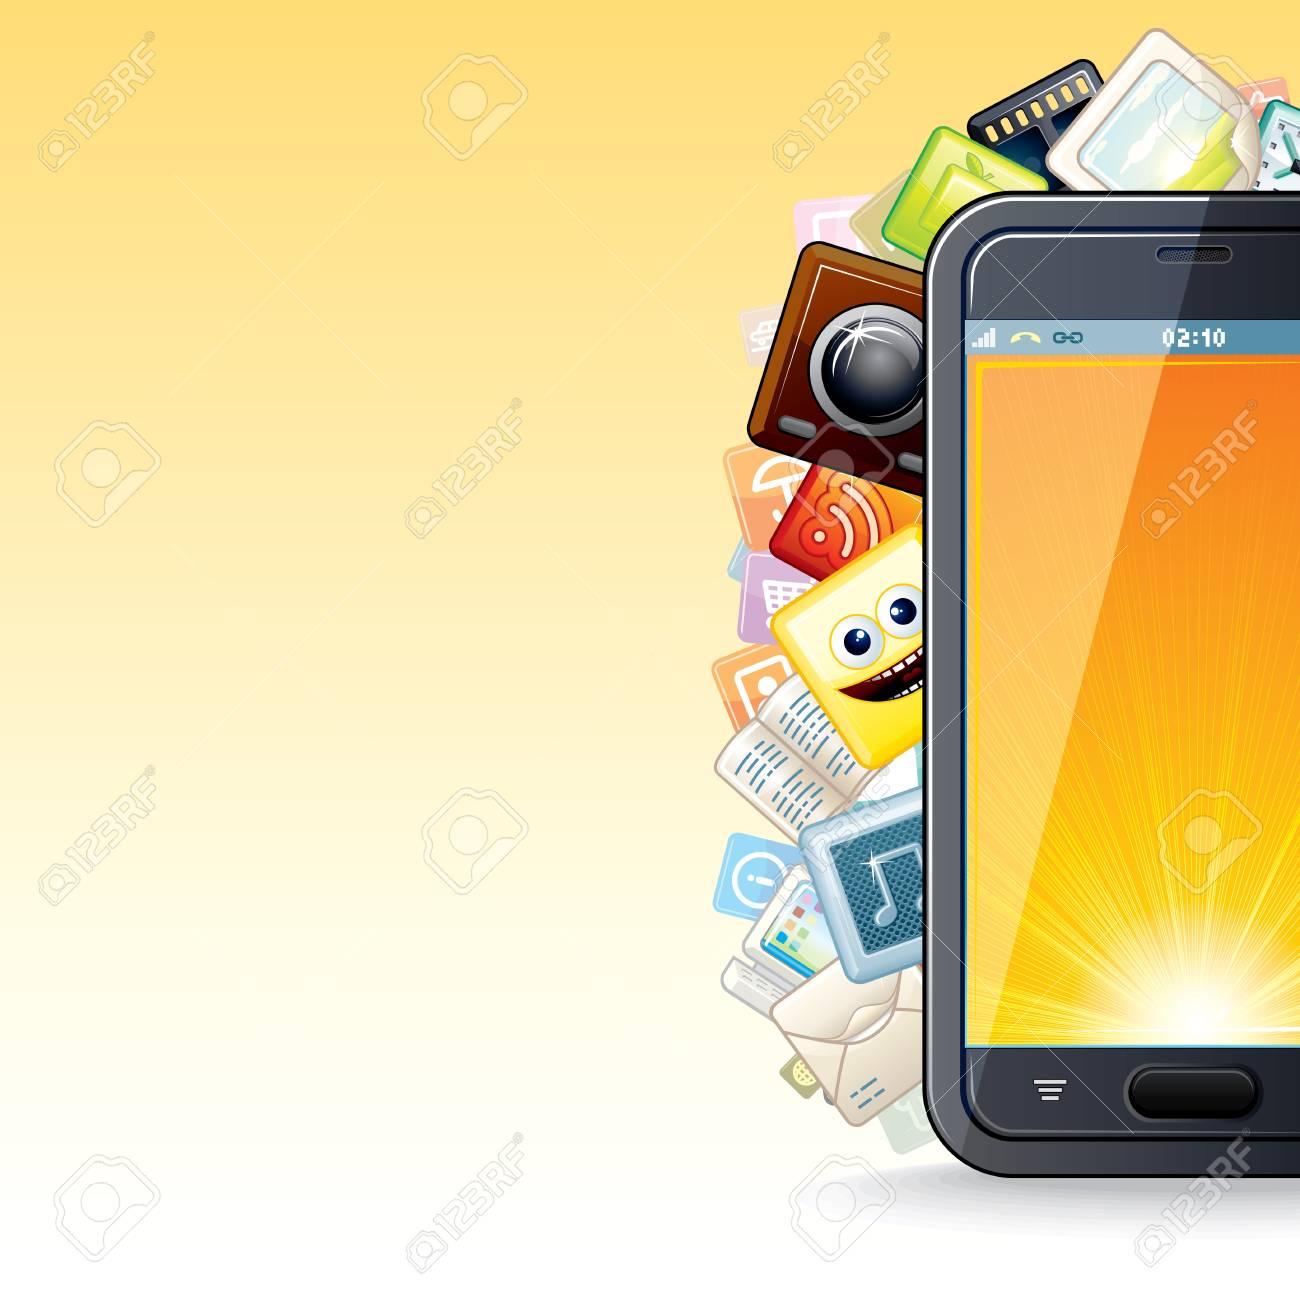 Smart Phone Apps Poster  Illustration Stock Photo - 18847811